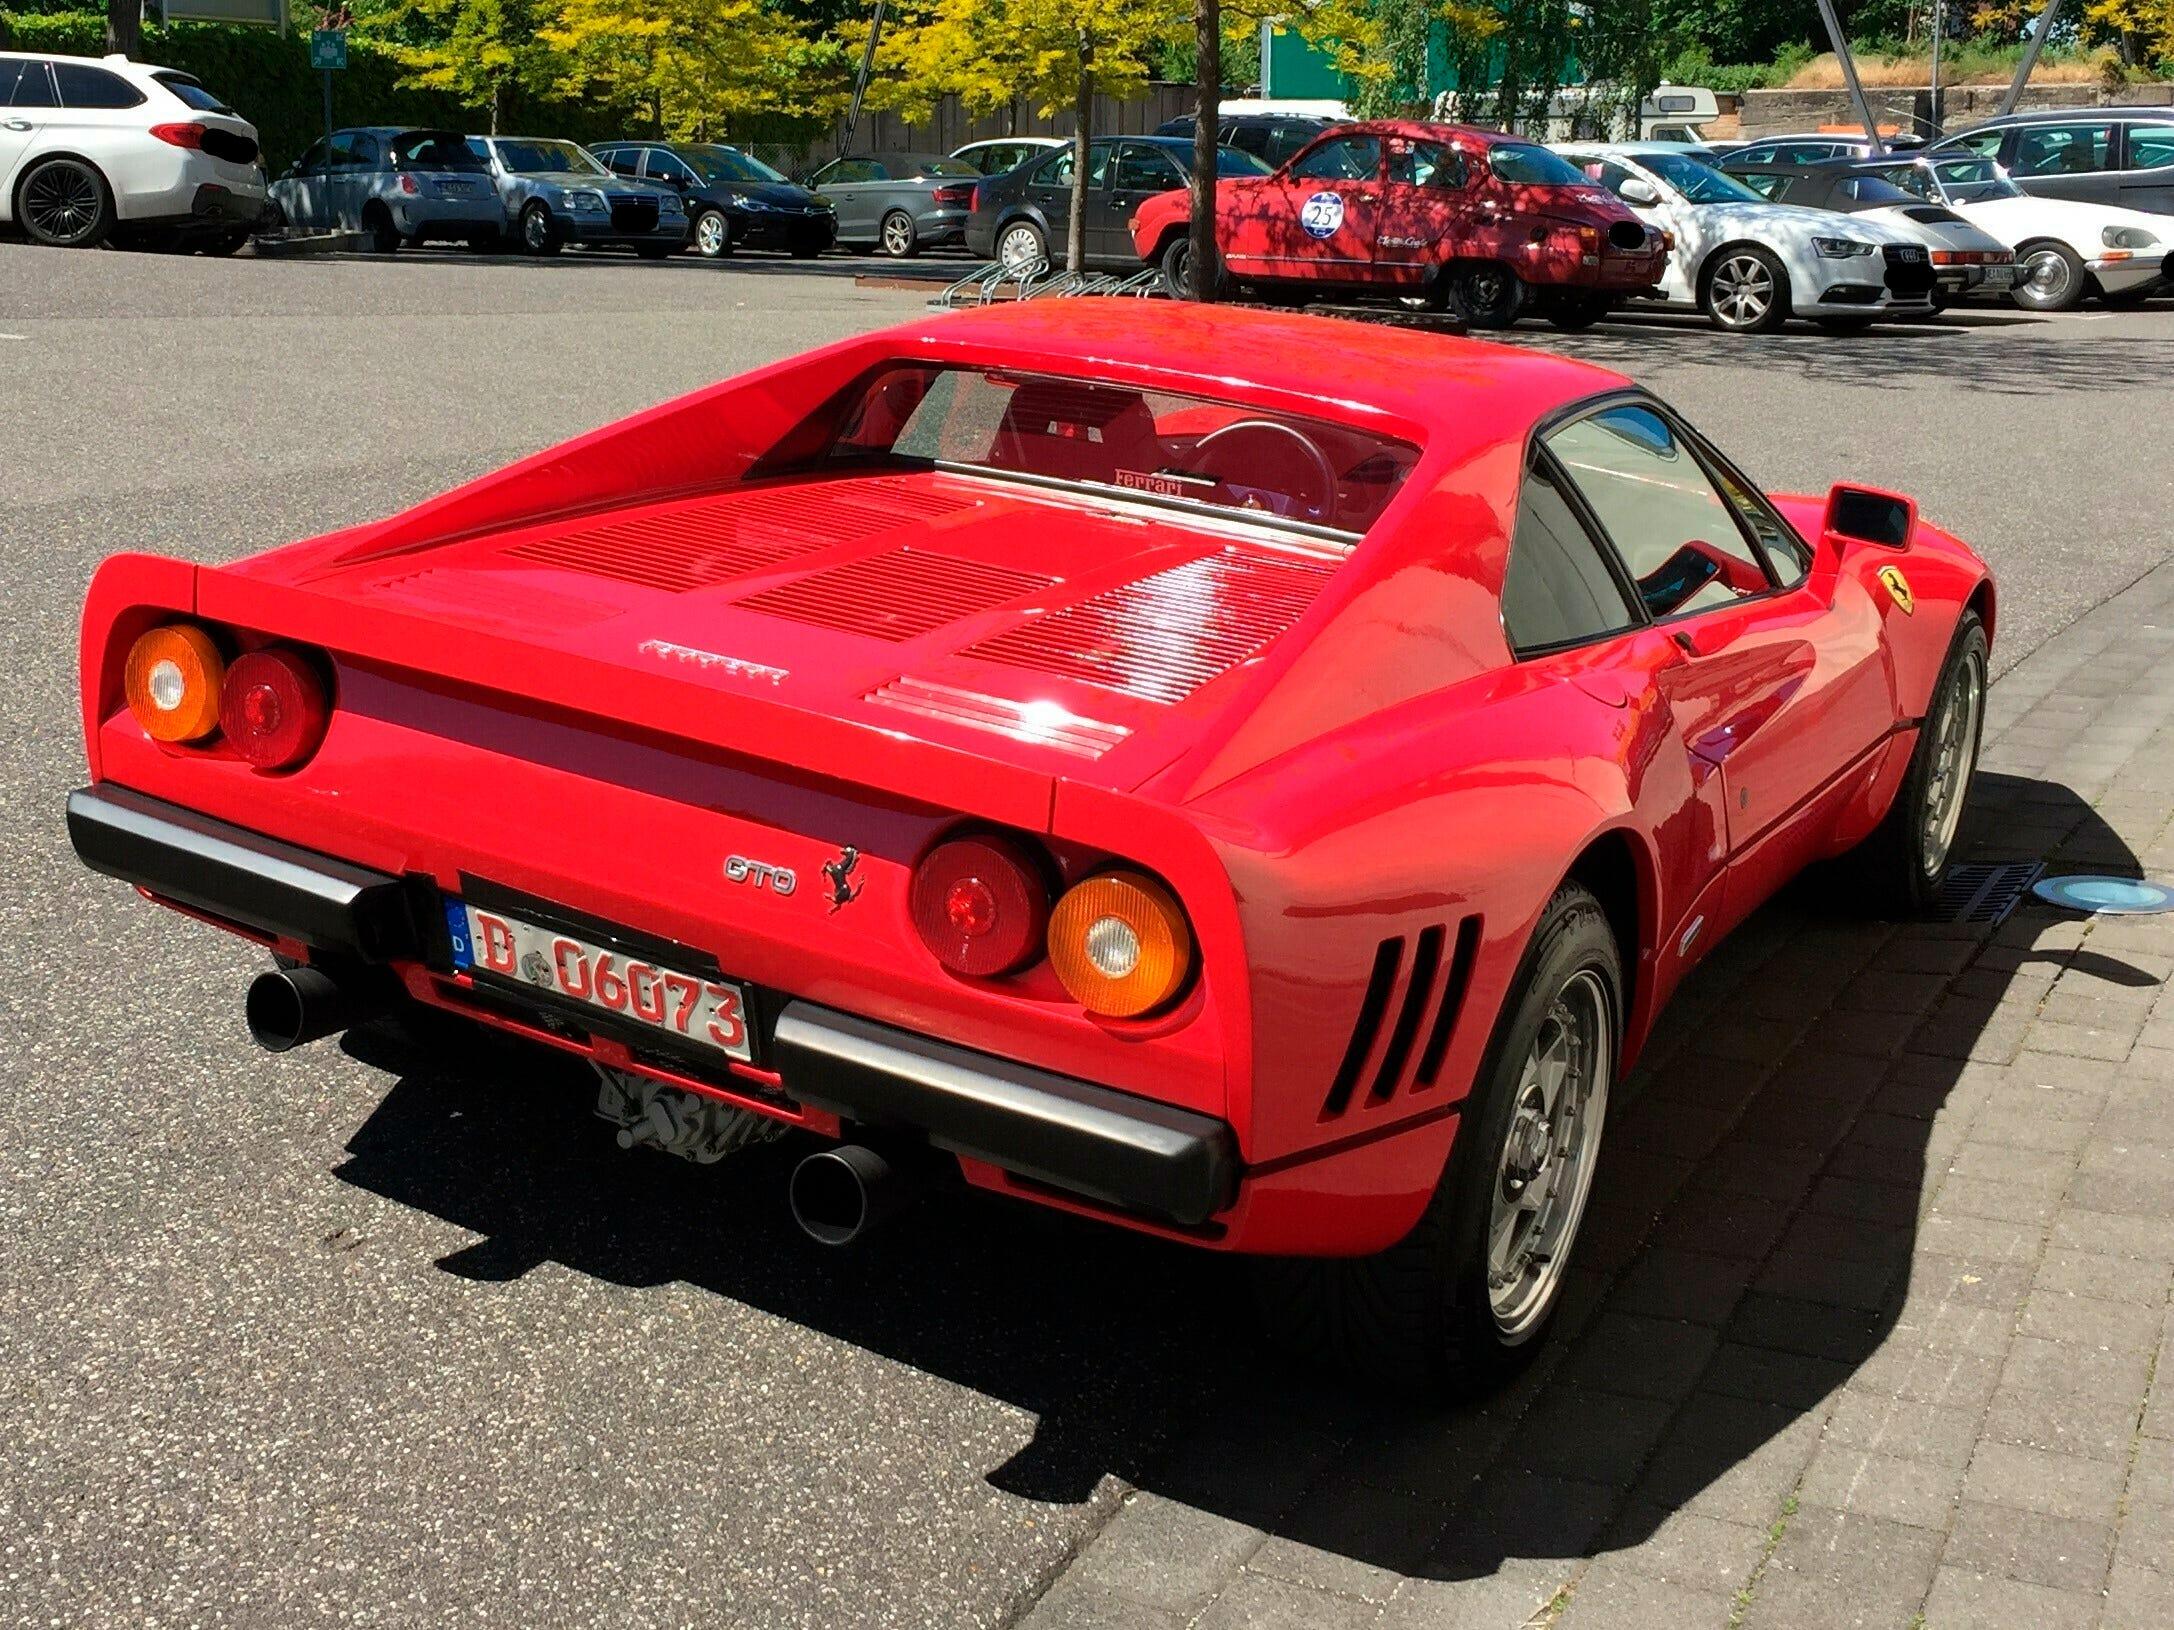 Vintage $2.2 million Ferrari stolen by possible buyer, later